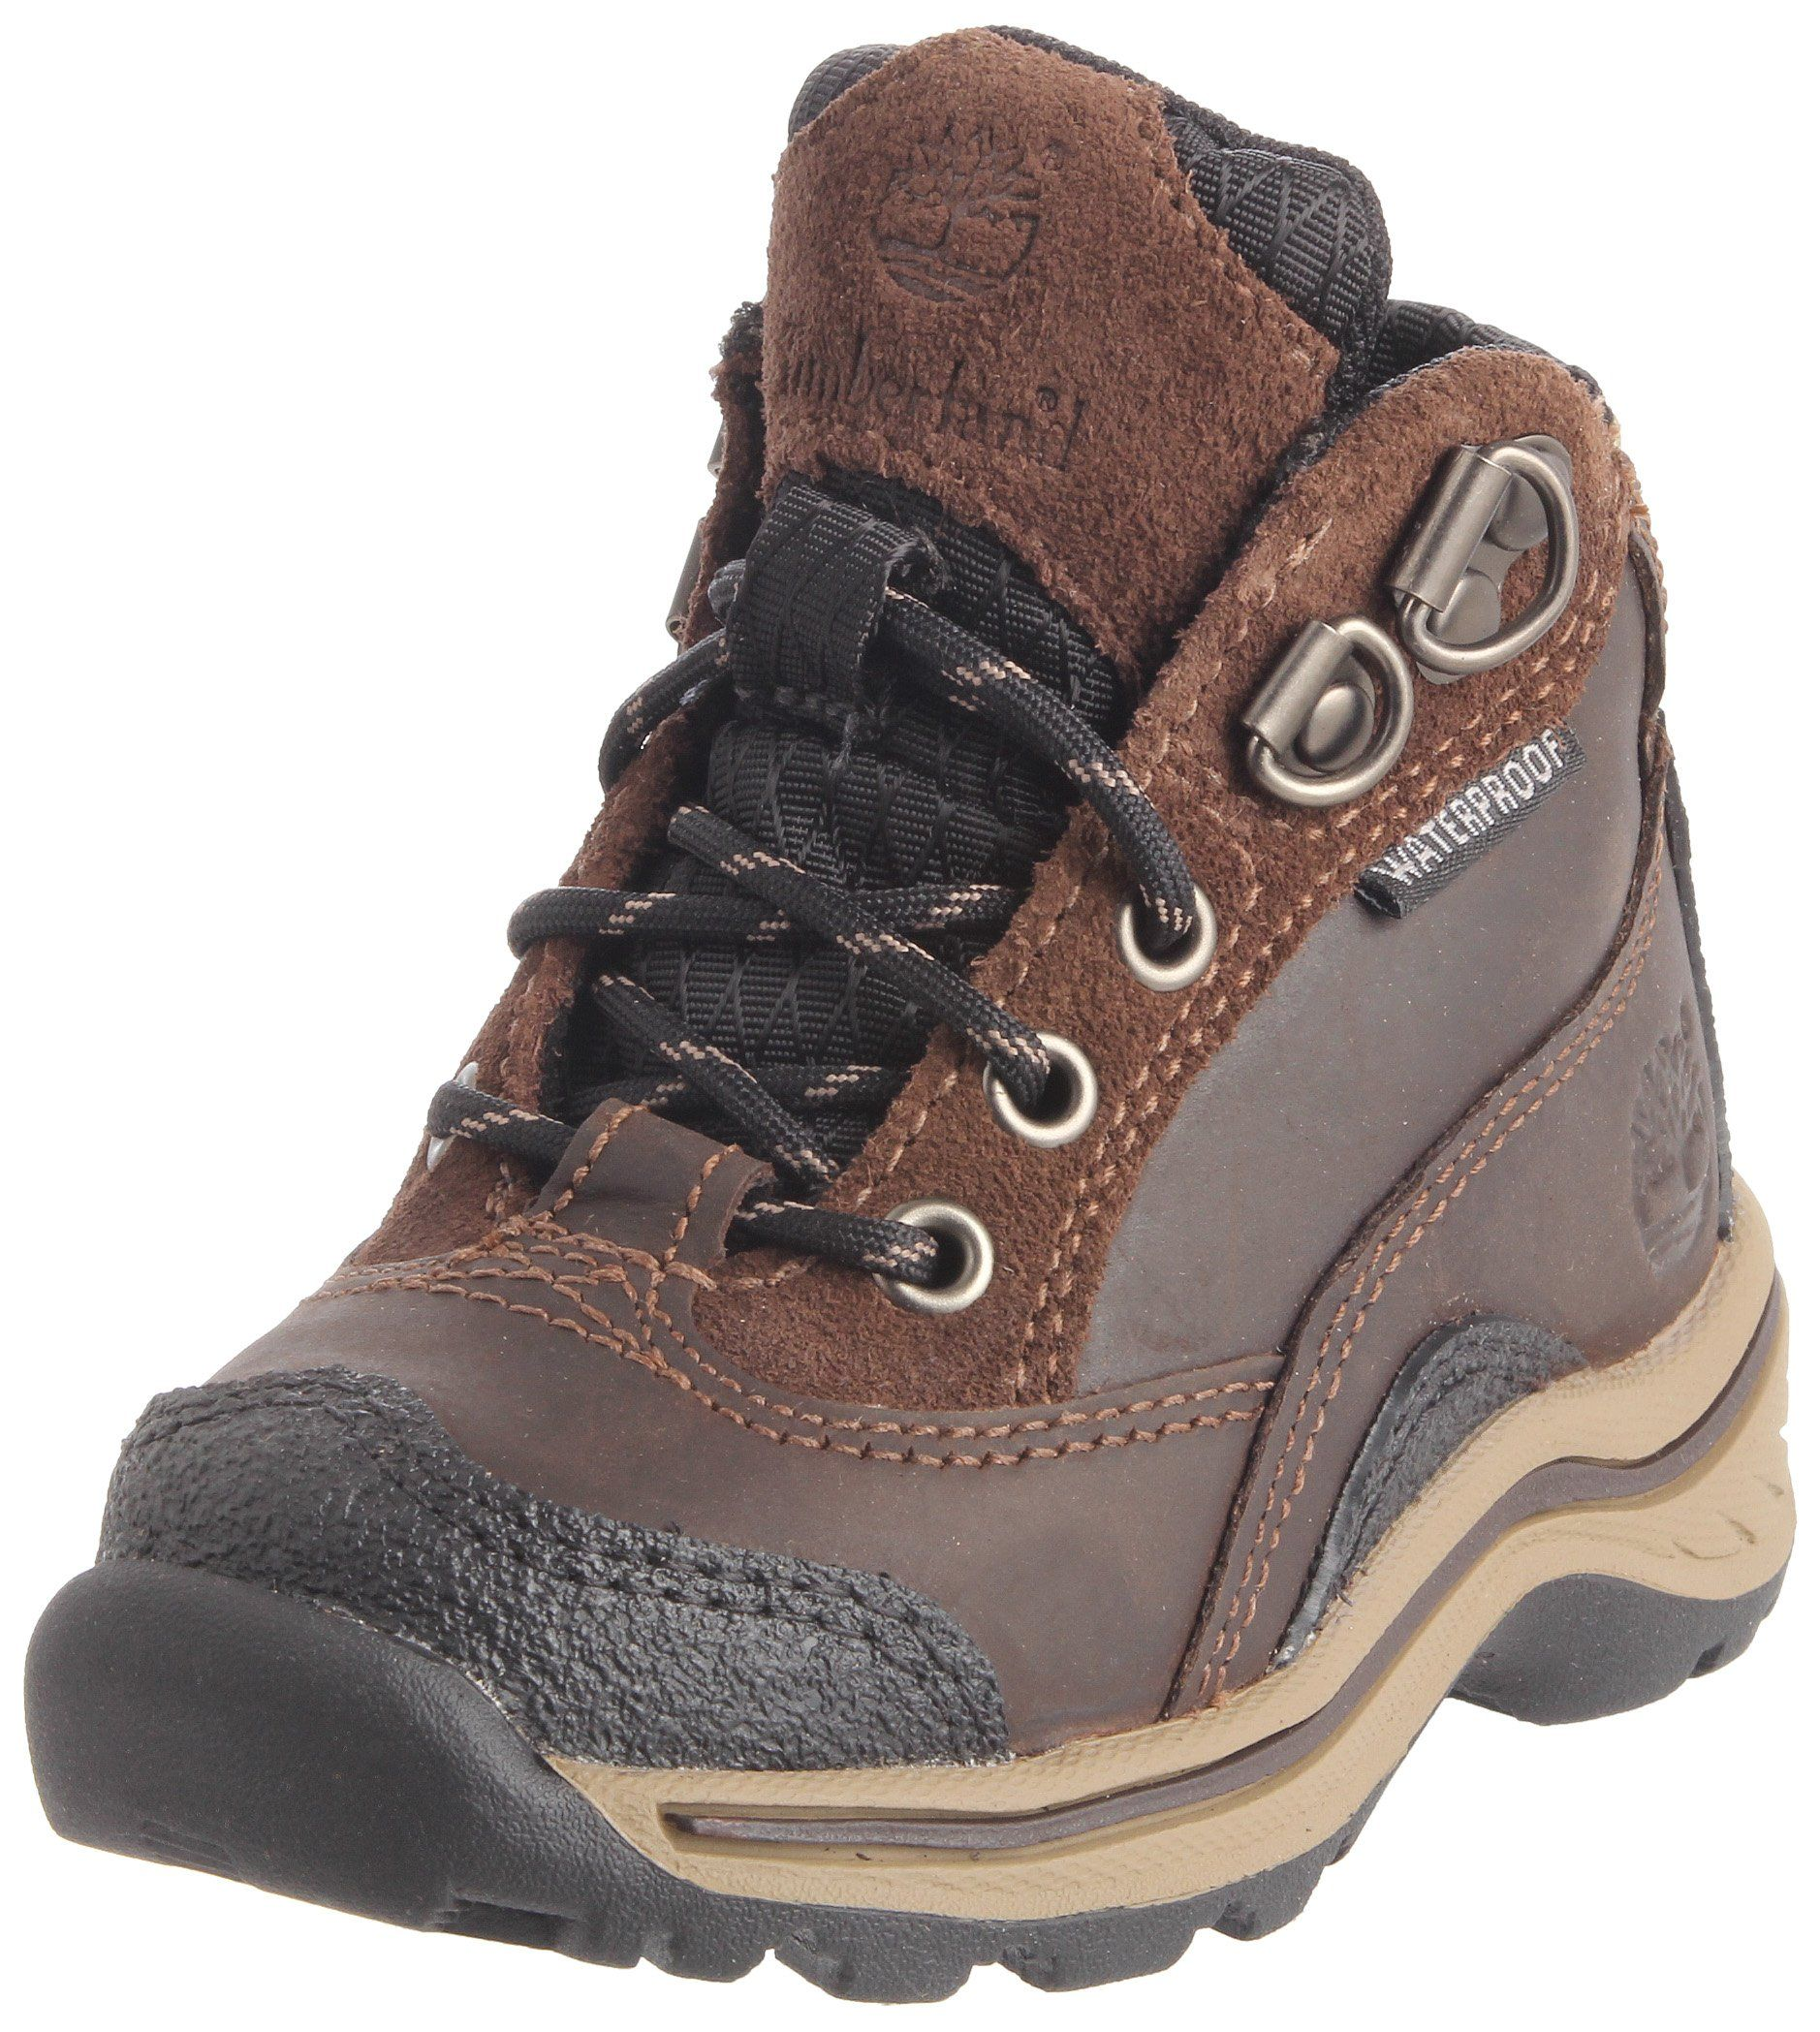 Timberland Pawtuckaway Lace Hiker (Toddler/Little Kid/Big Kid),Brown,.  Ethylene Vinyl AcetateWaterproof Hiking BootsKid ...